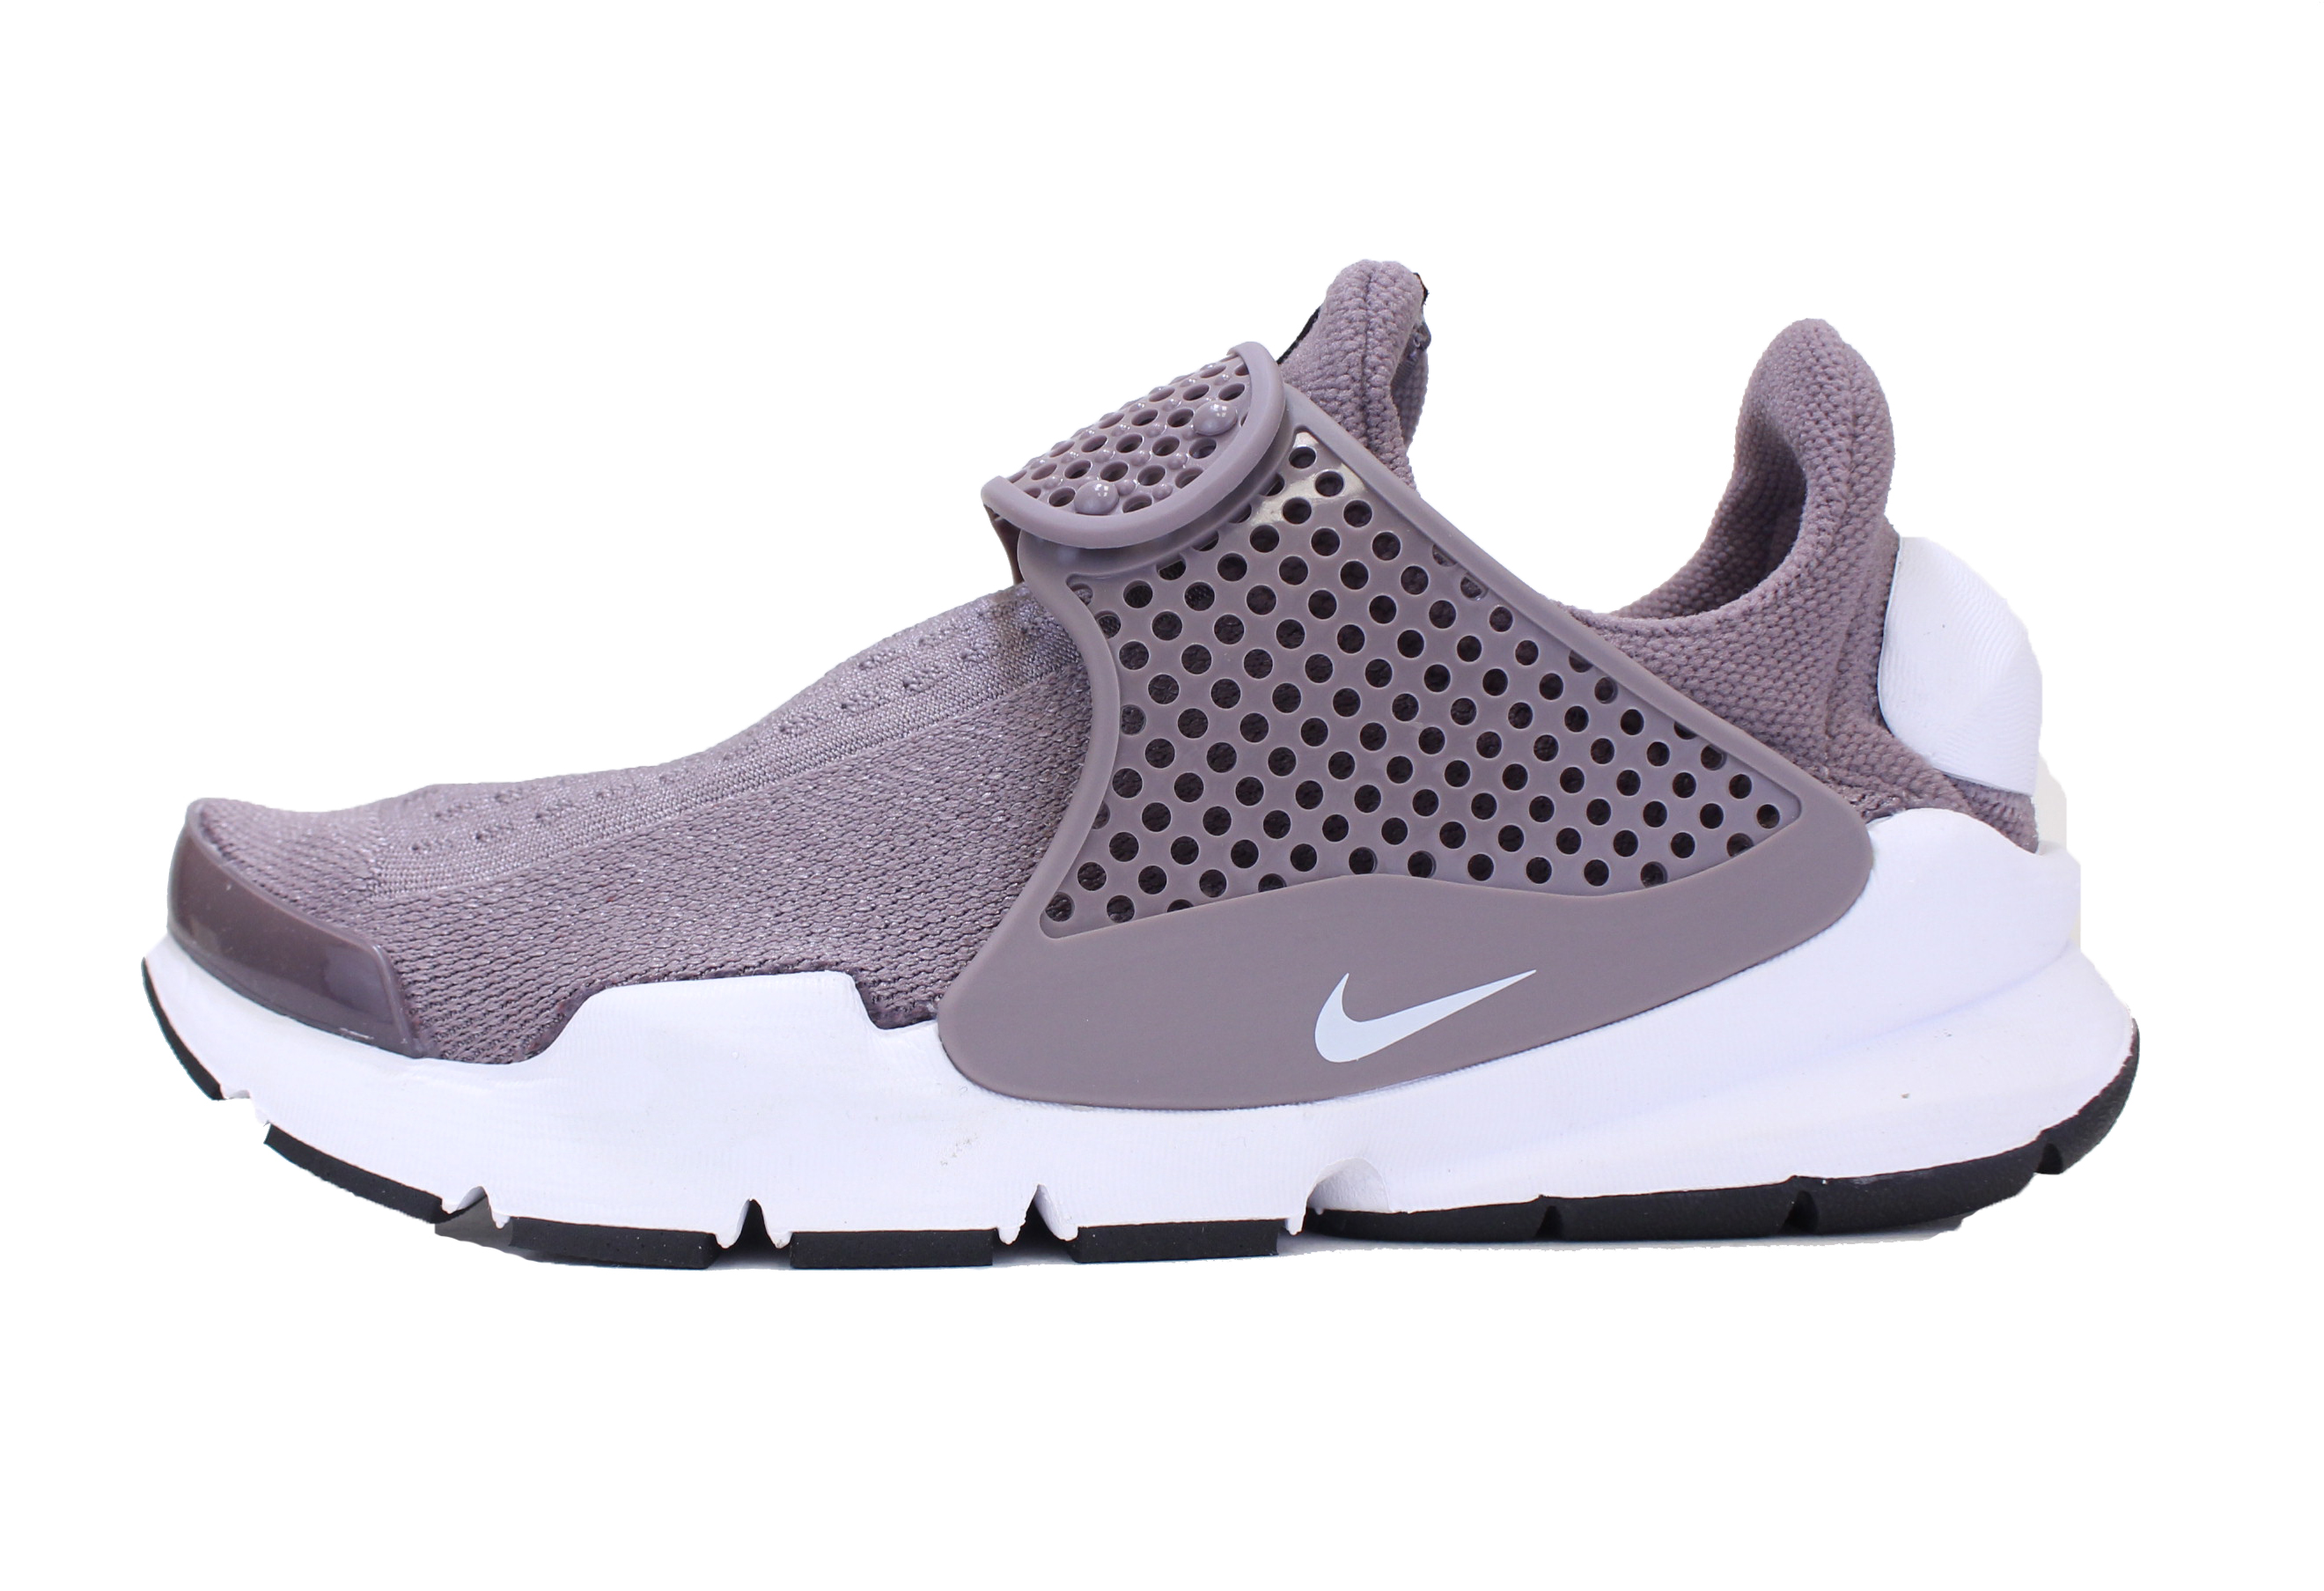 0f45dc3a Nike - NIKE WOMENS SOCK DART SZ 6 TAUPE GREY WHITE BLACK SLIP ON RUNNING  SHOES 848475 201 - Walmart.com